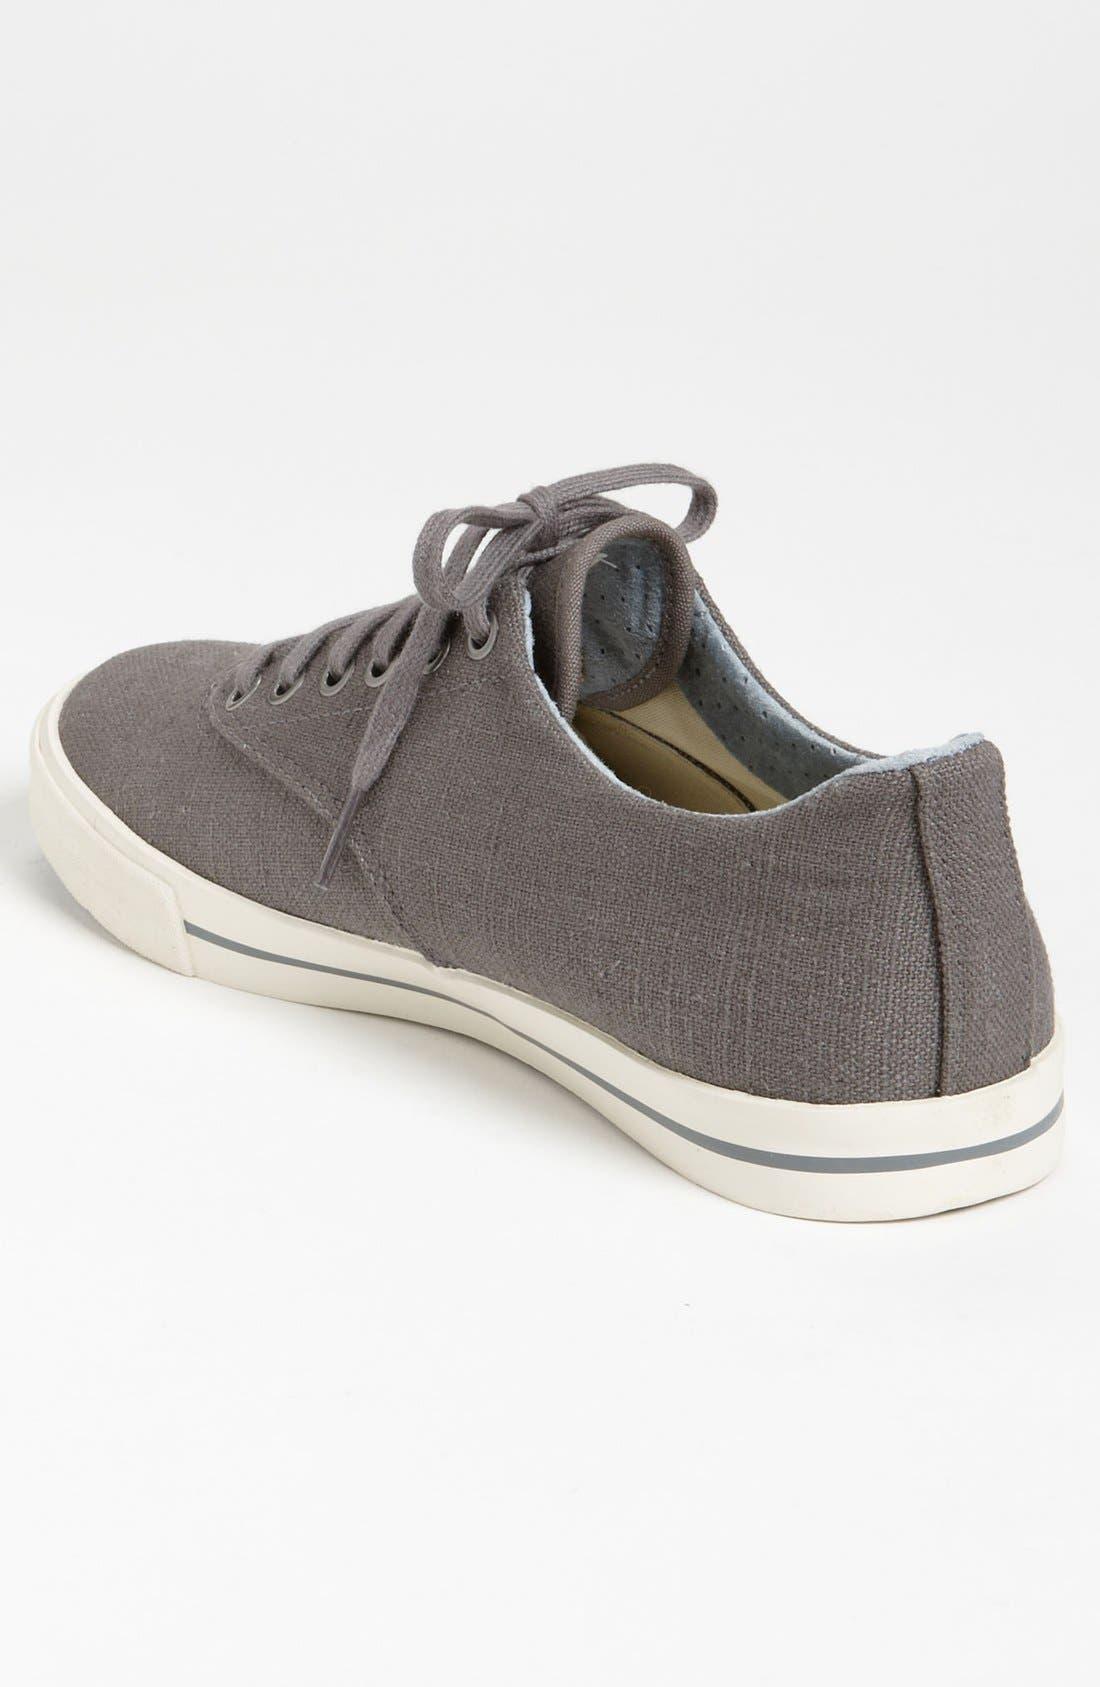 'Hermosa Plimsoll' Sneaker,                             Alternate thumbnail 9, color,                             TIN GREY VINTAGE WASH LINEN